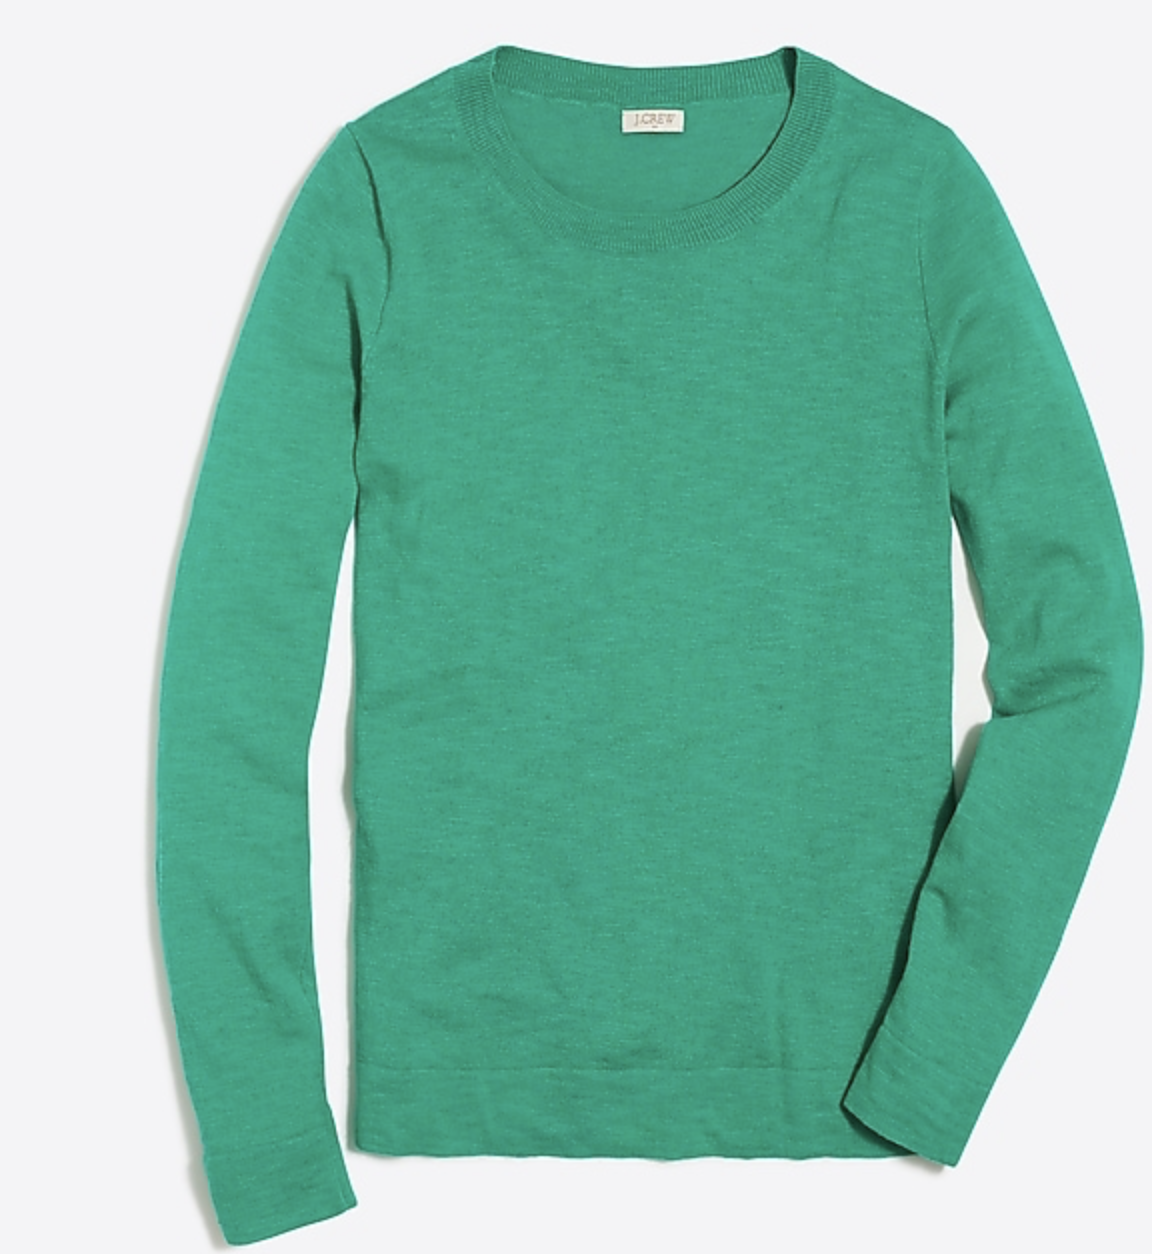 green sweater Kelly green fashion